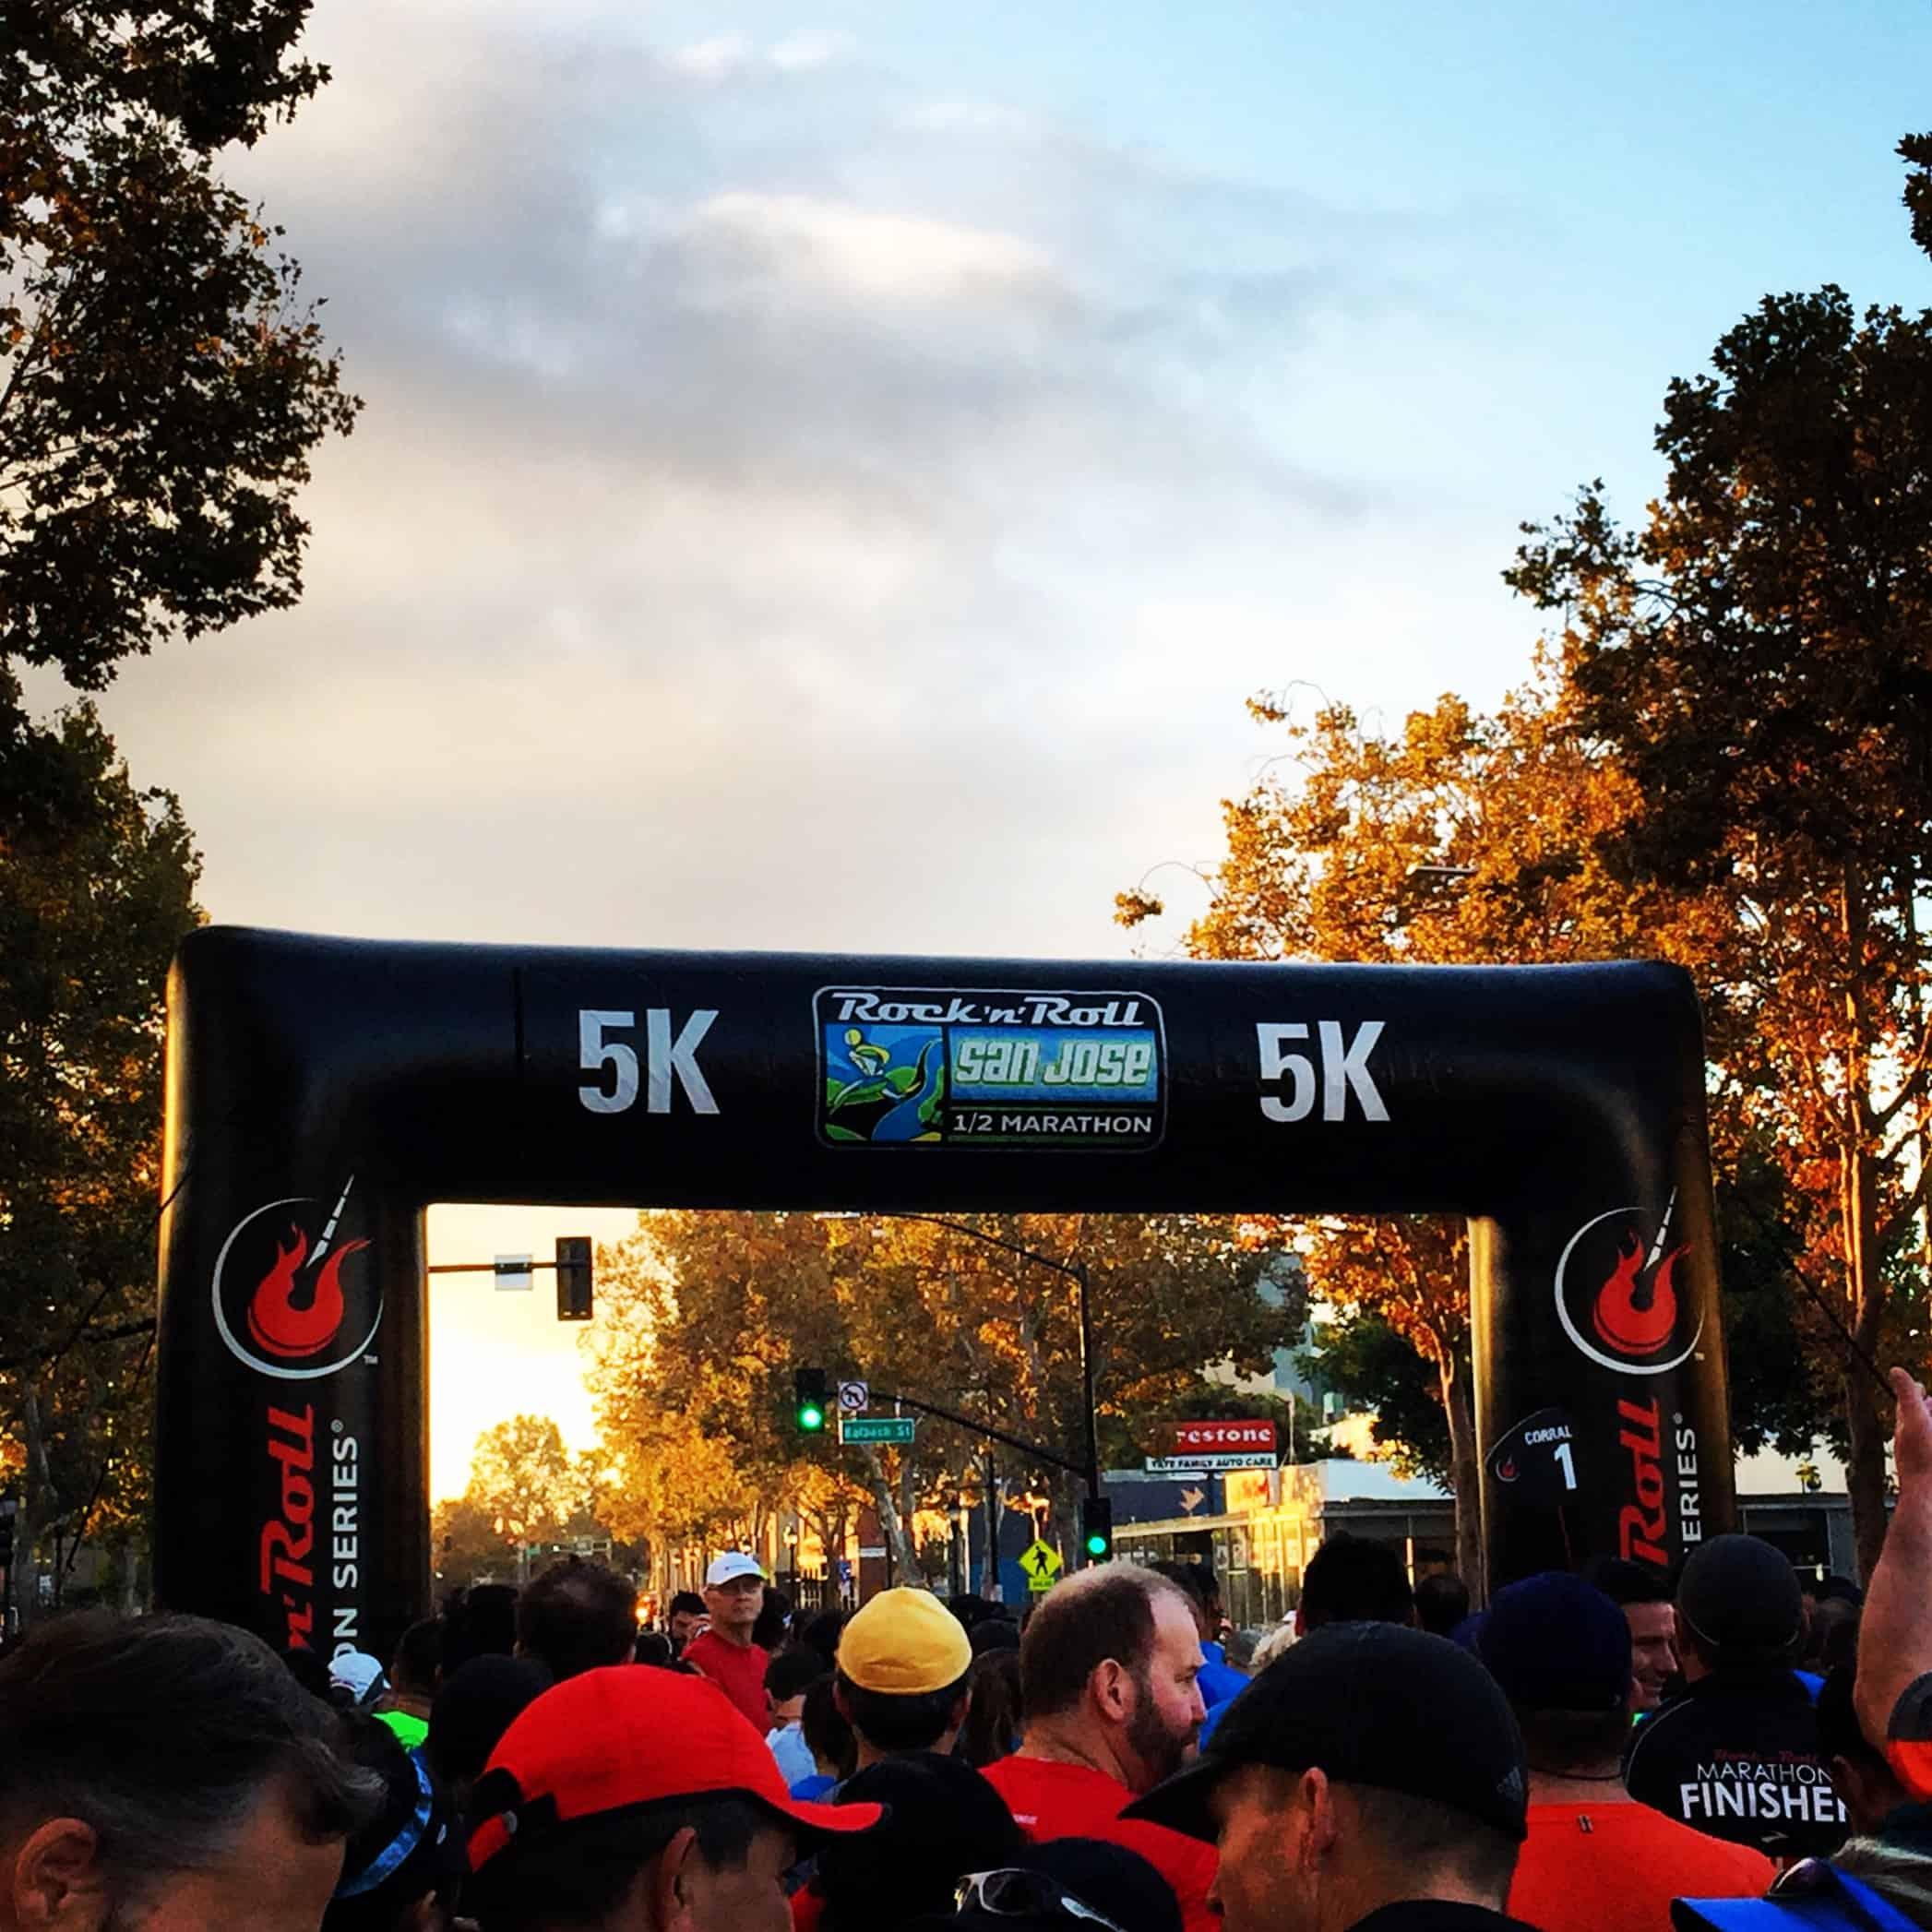 5k starting line